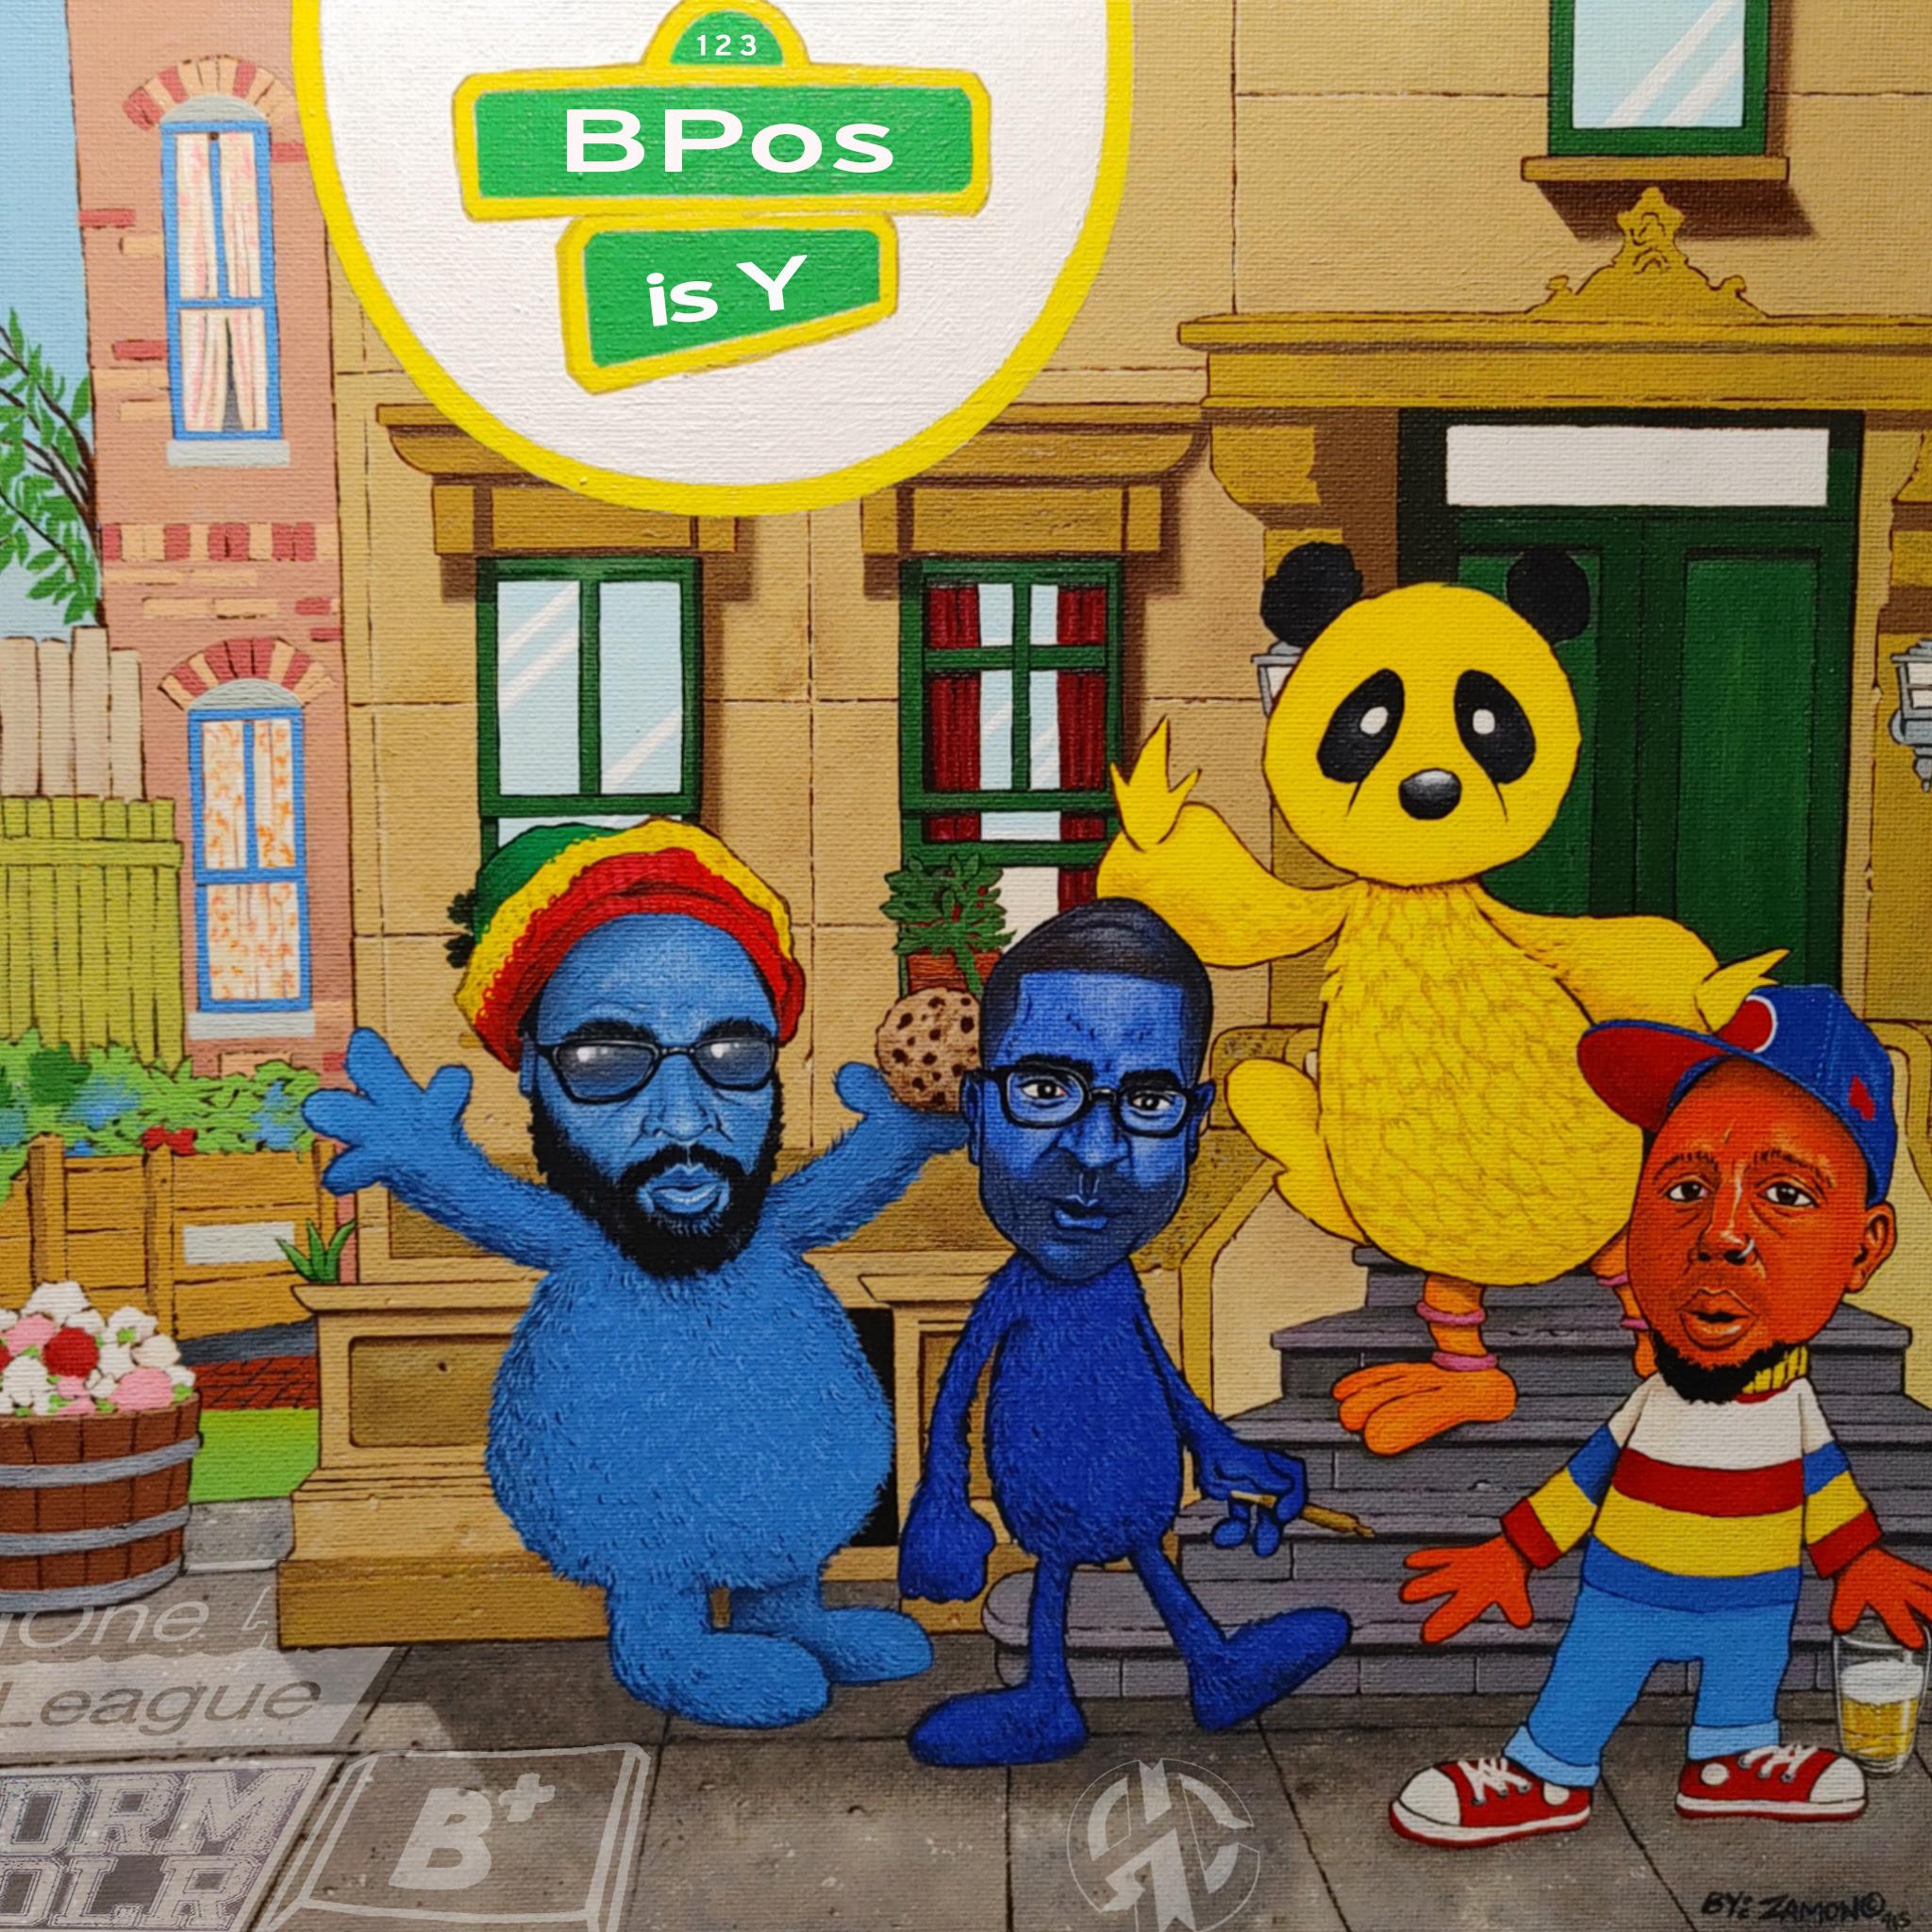 BPos drops 7th Full Length LP 'BPos is Y'